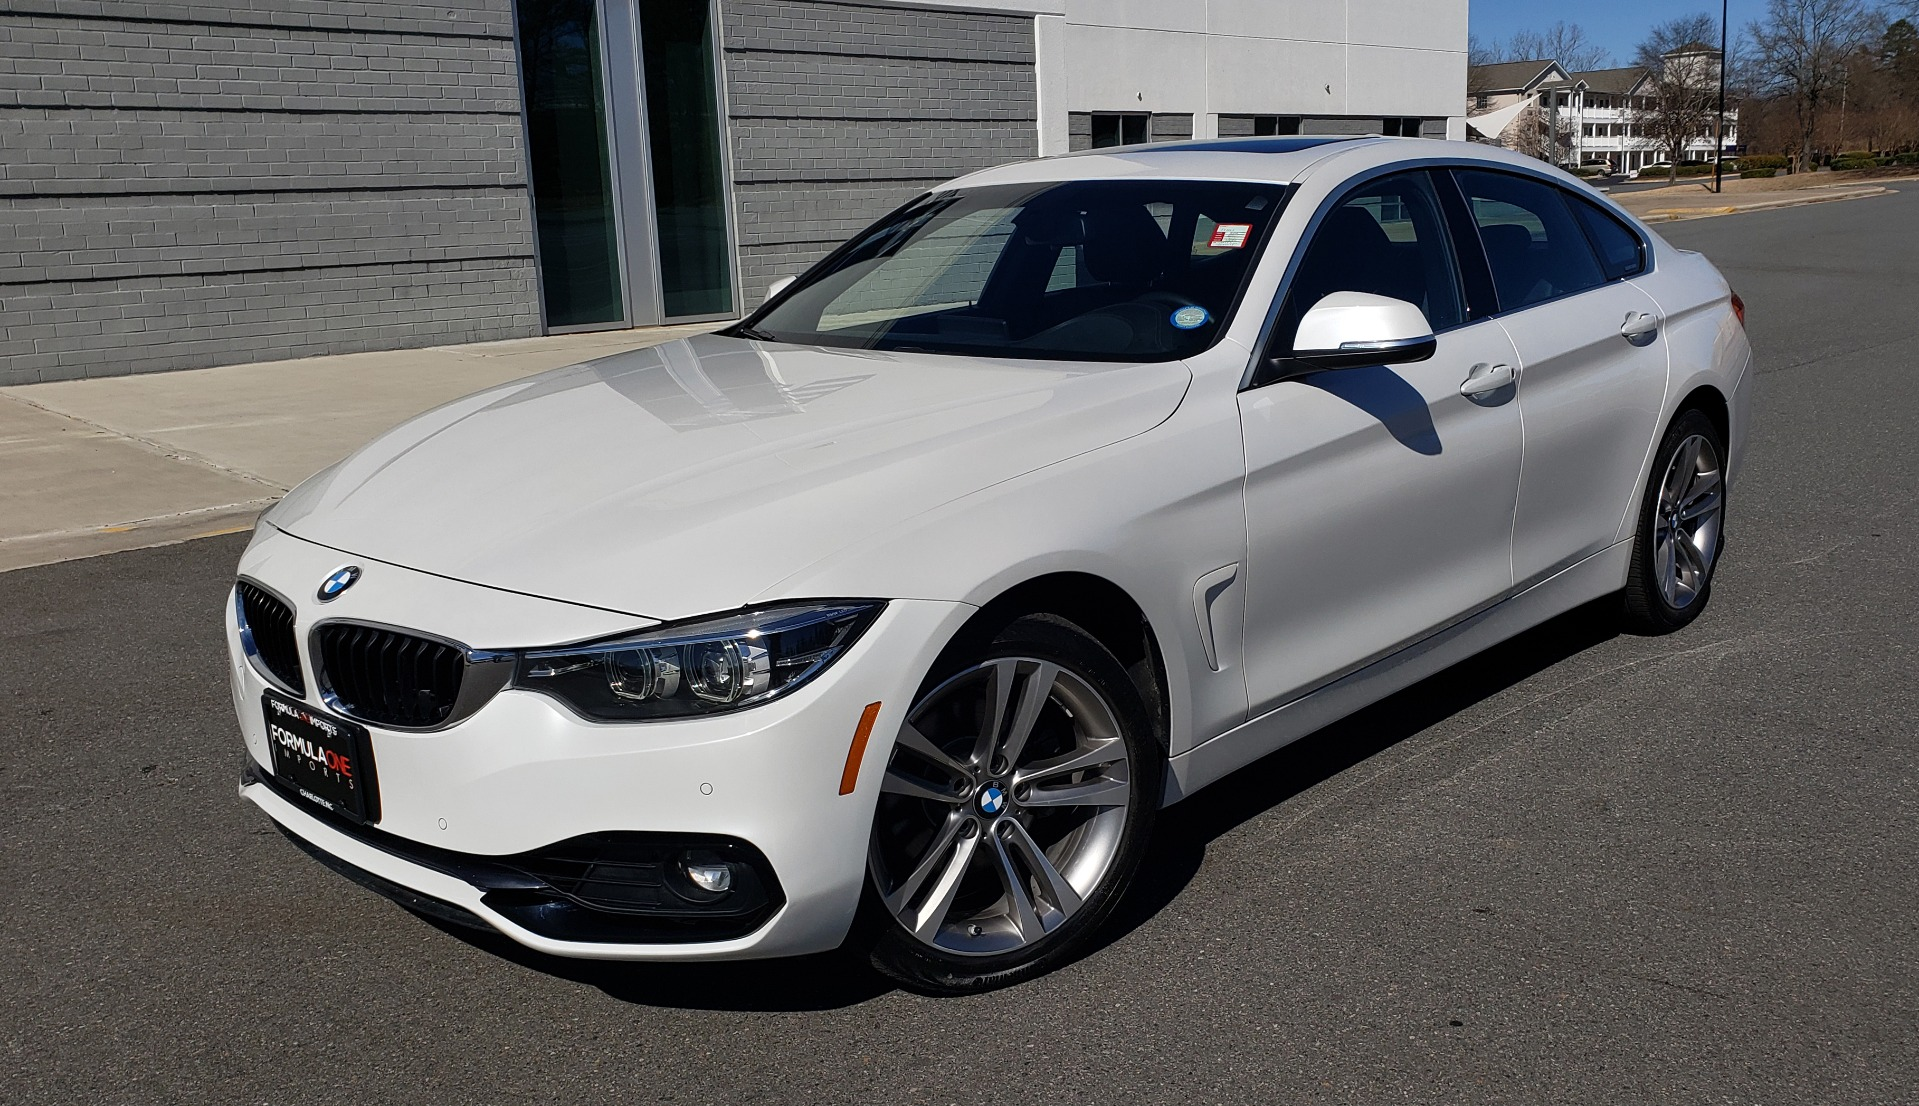 Used 2018 BMW 4 SERIES 430IXDRIVE / PREMIUM / NAV / SUNROOF / ESSENTIALS PKG for sale $28,995 at Formula Imports in Charlotte NC 28227 1